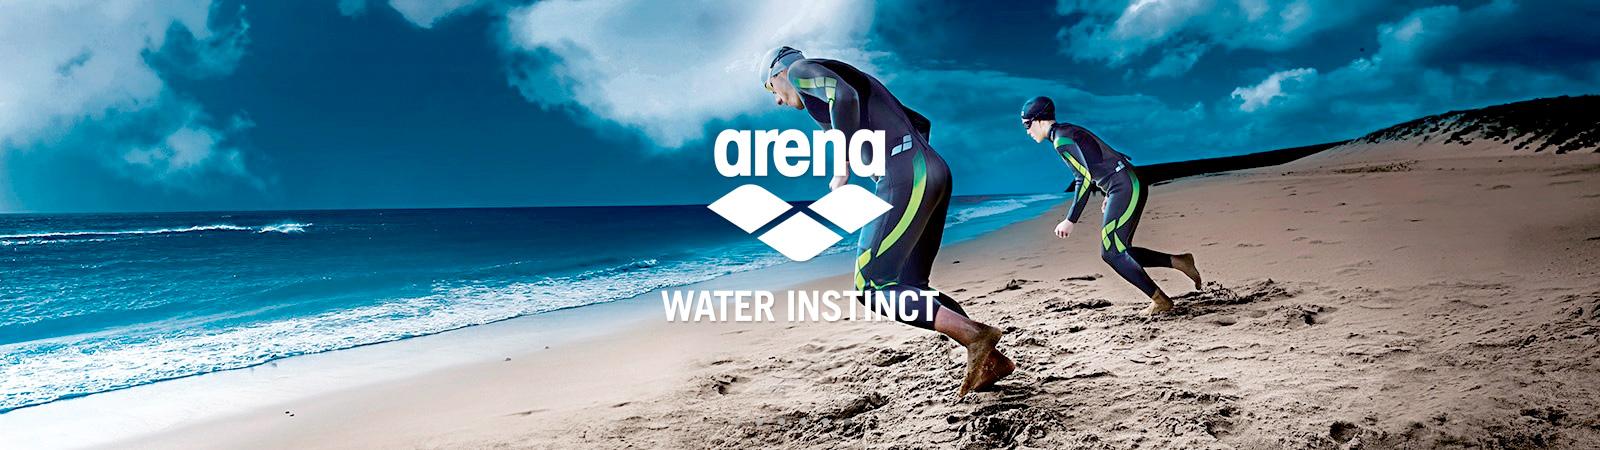 www.arenawaterinstinct.com